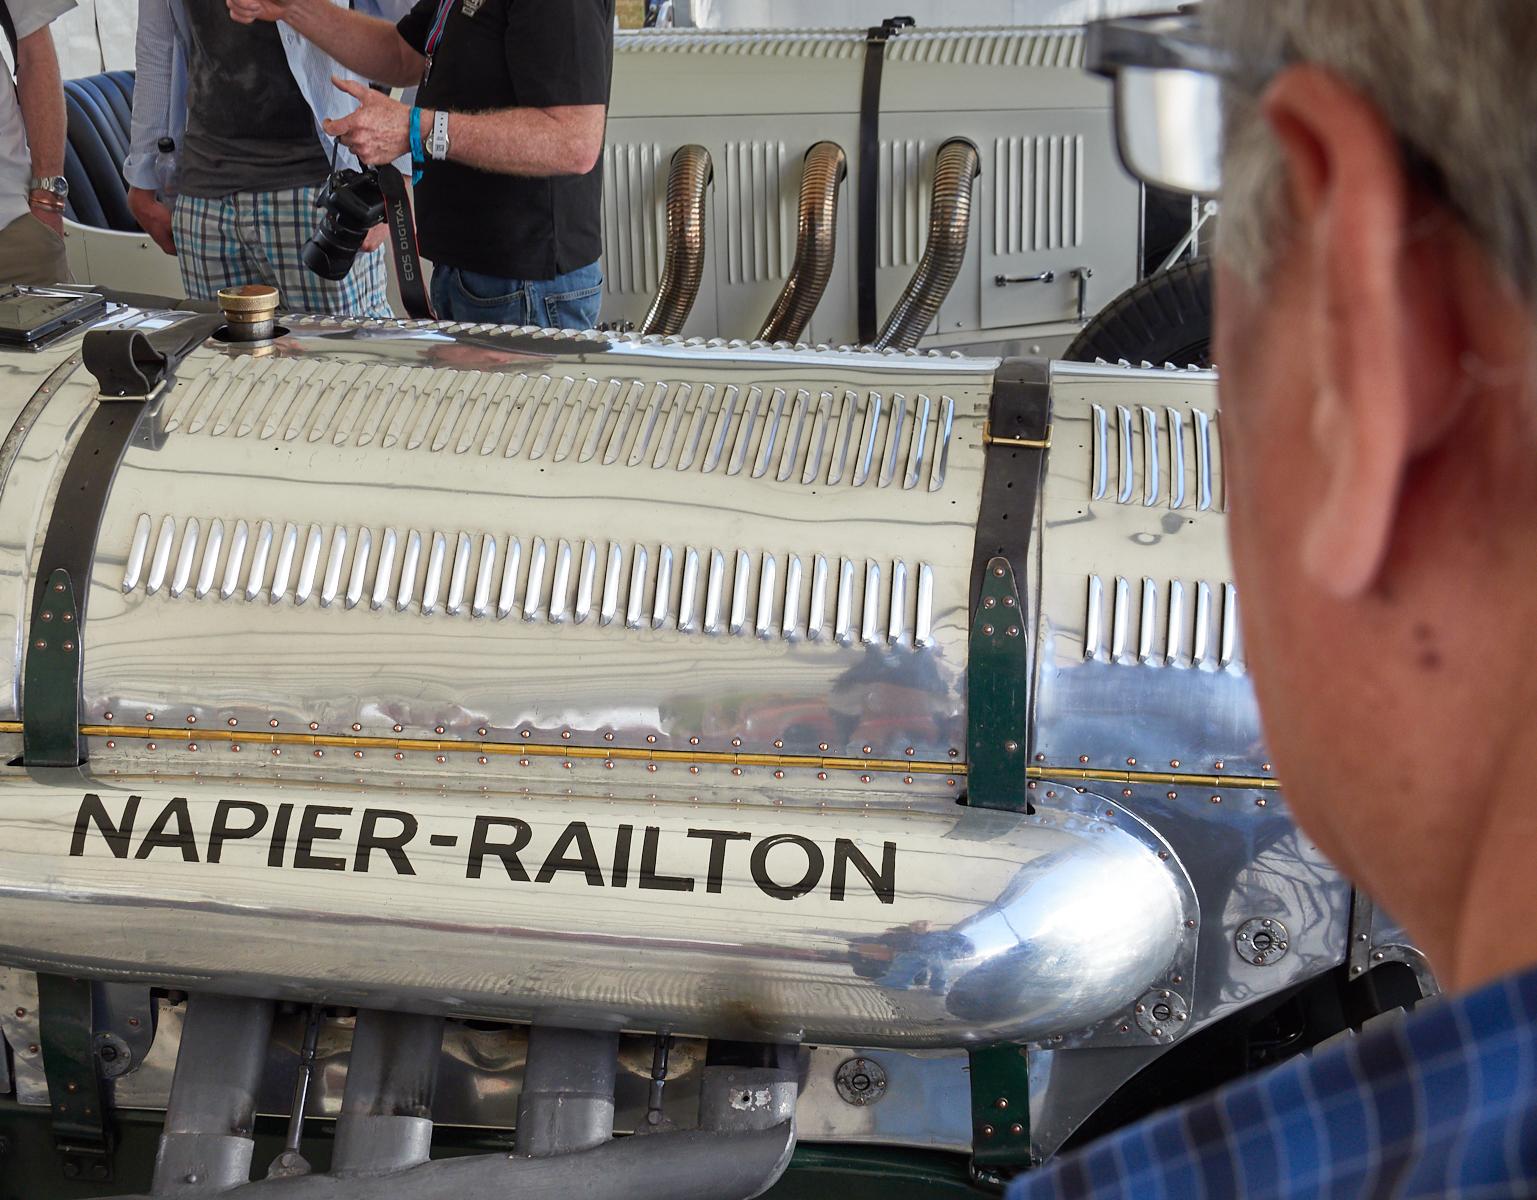 Nasir Napier Railton 1600x1200 sRGB.jpg